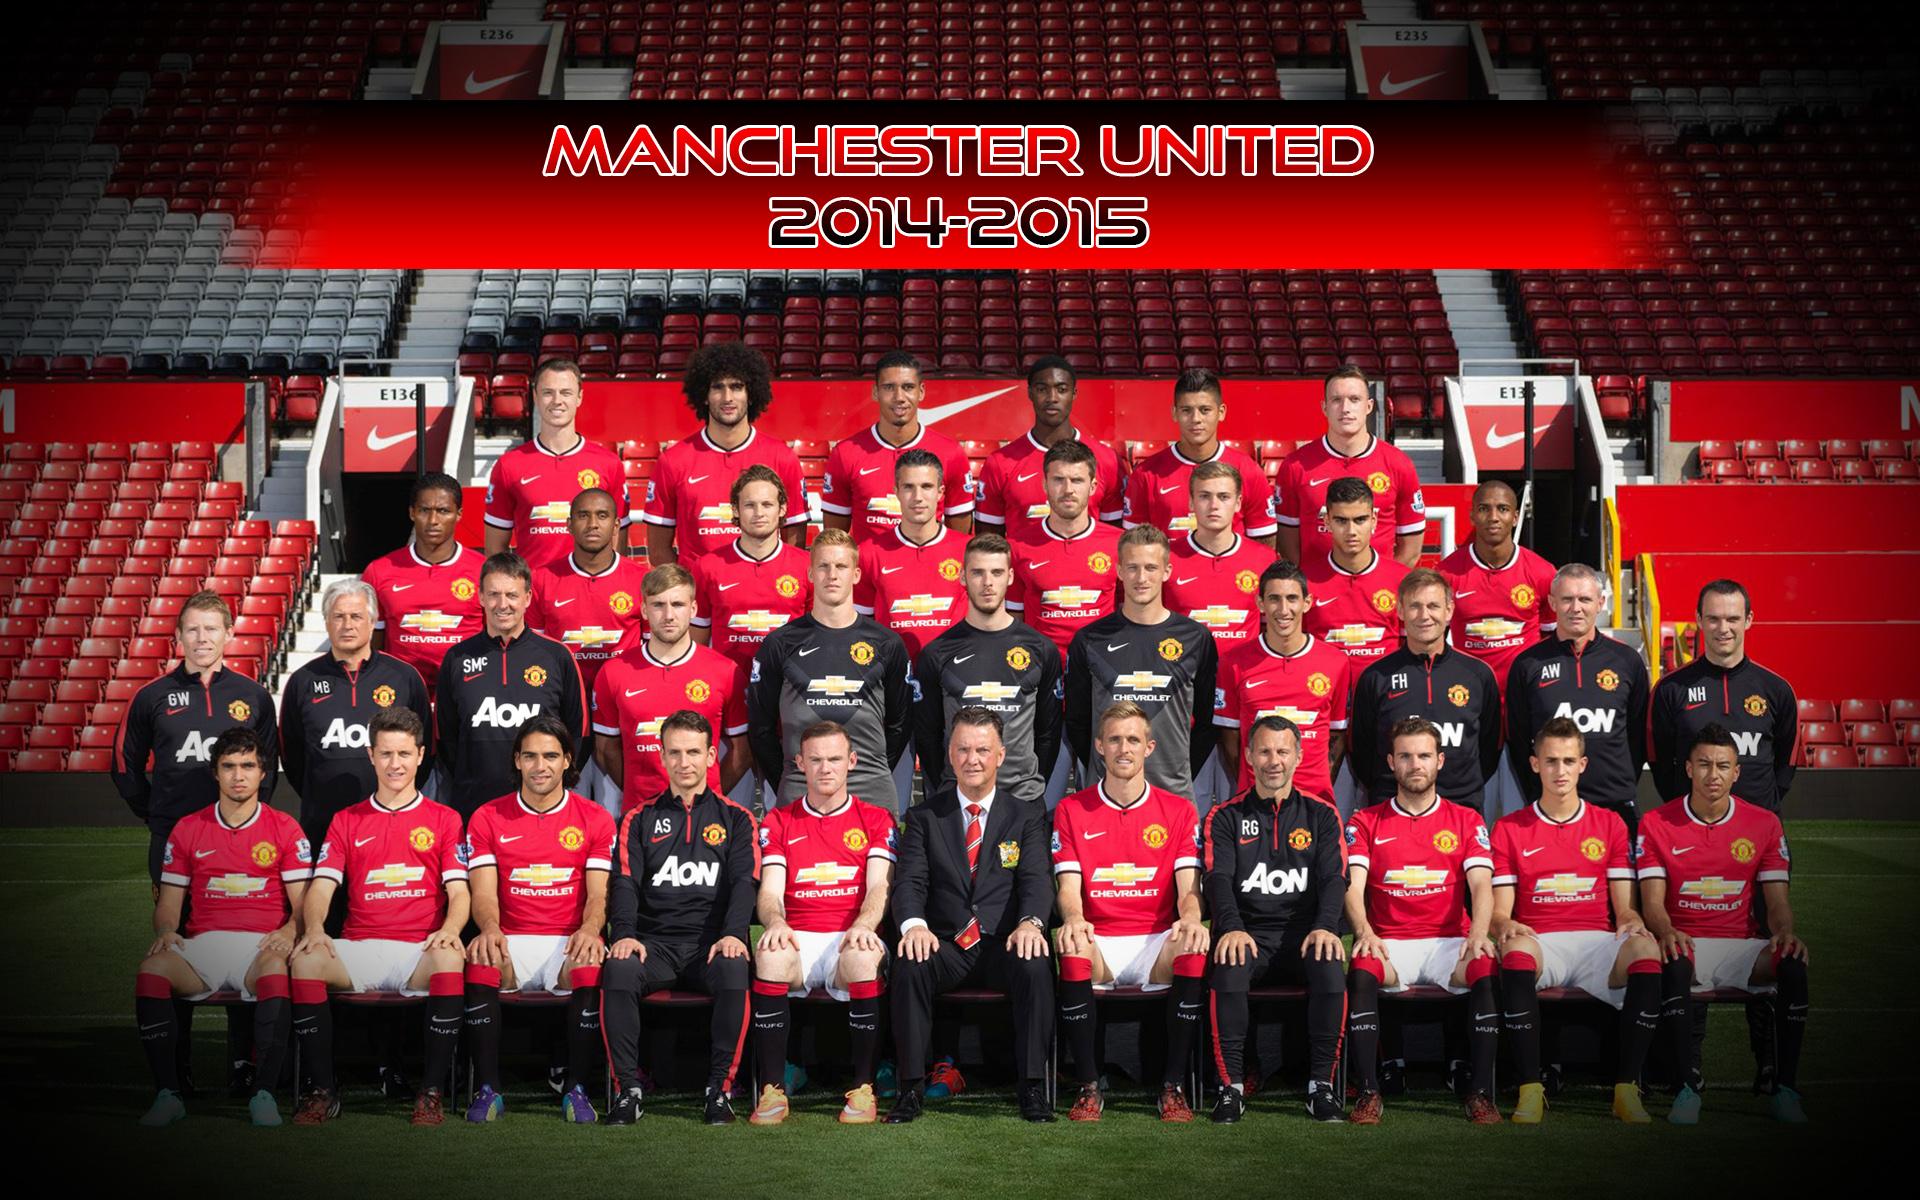 Manchester United 2014 2015 Squad Photo Wallpaper 1920x1200